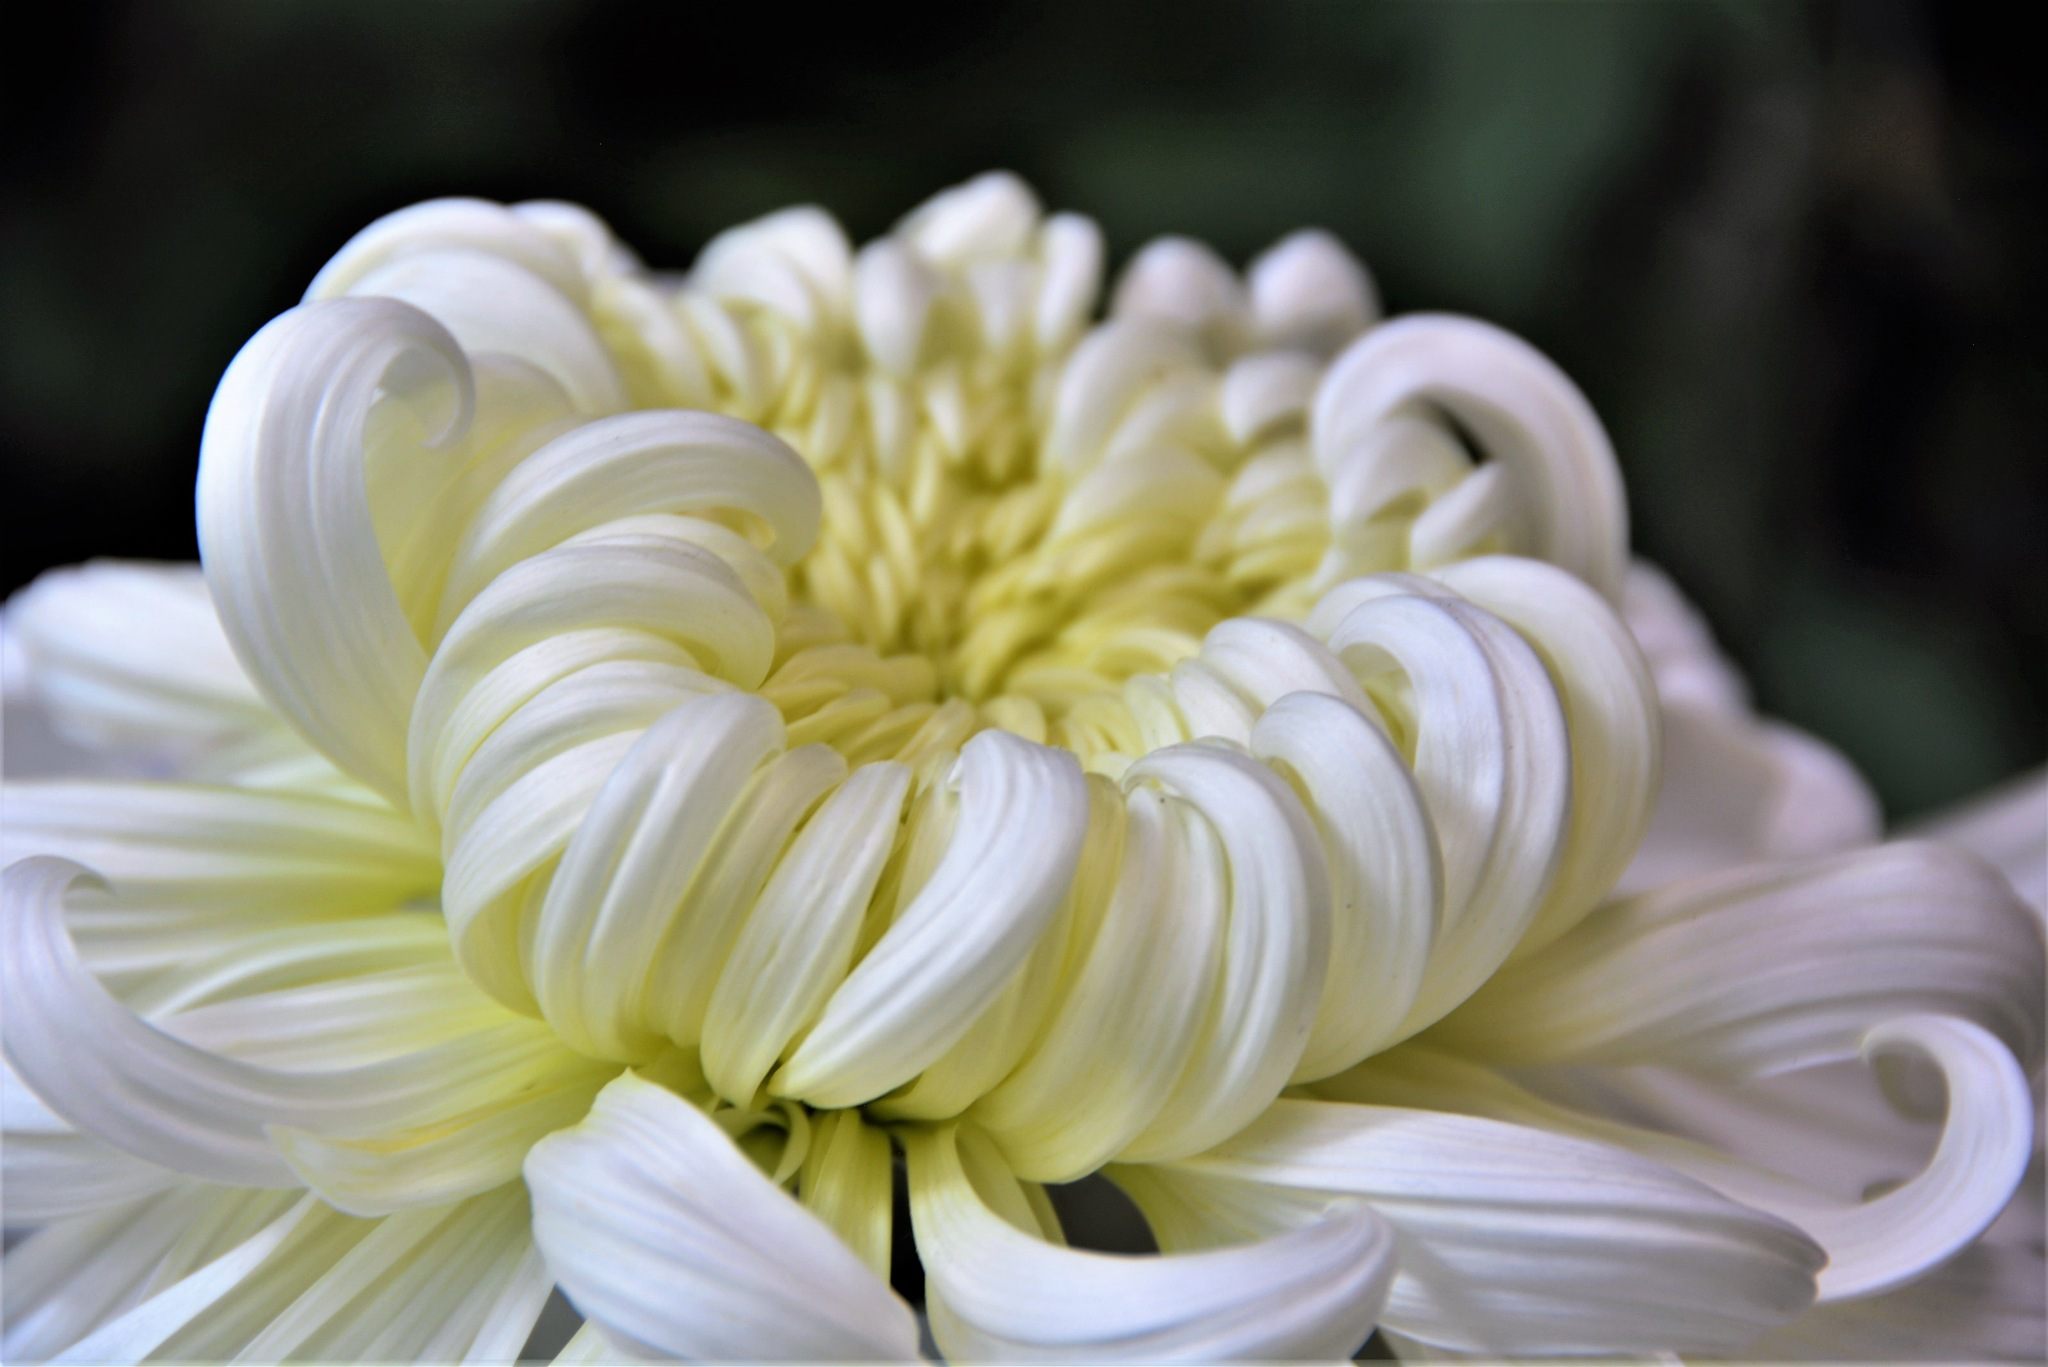 Chrysanthemum by Sharon C